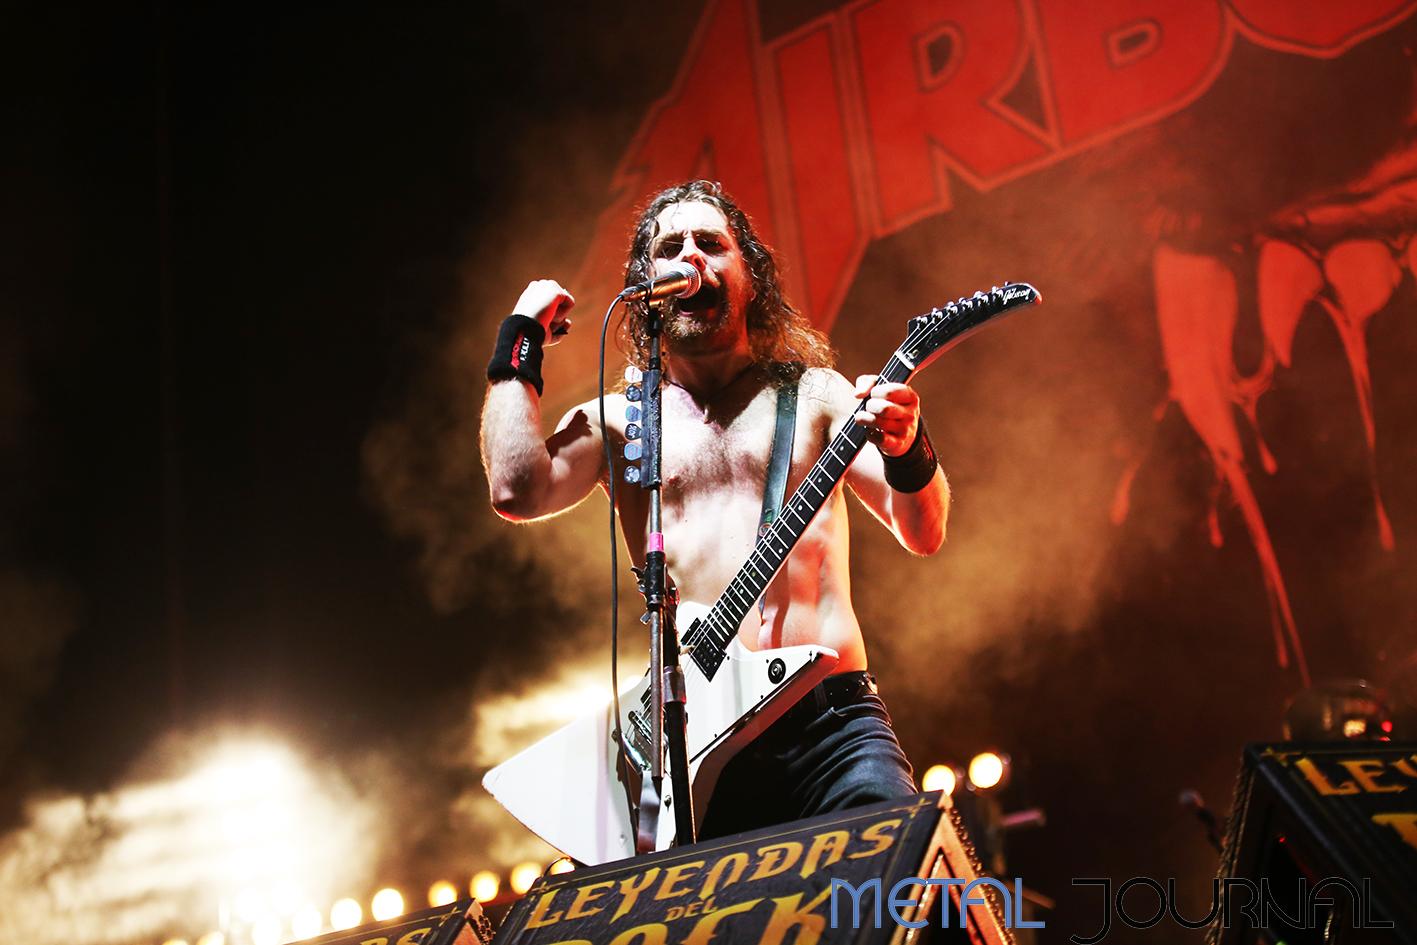 airbourne - leyendas del rock 2019 metal journal pic 11